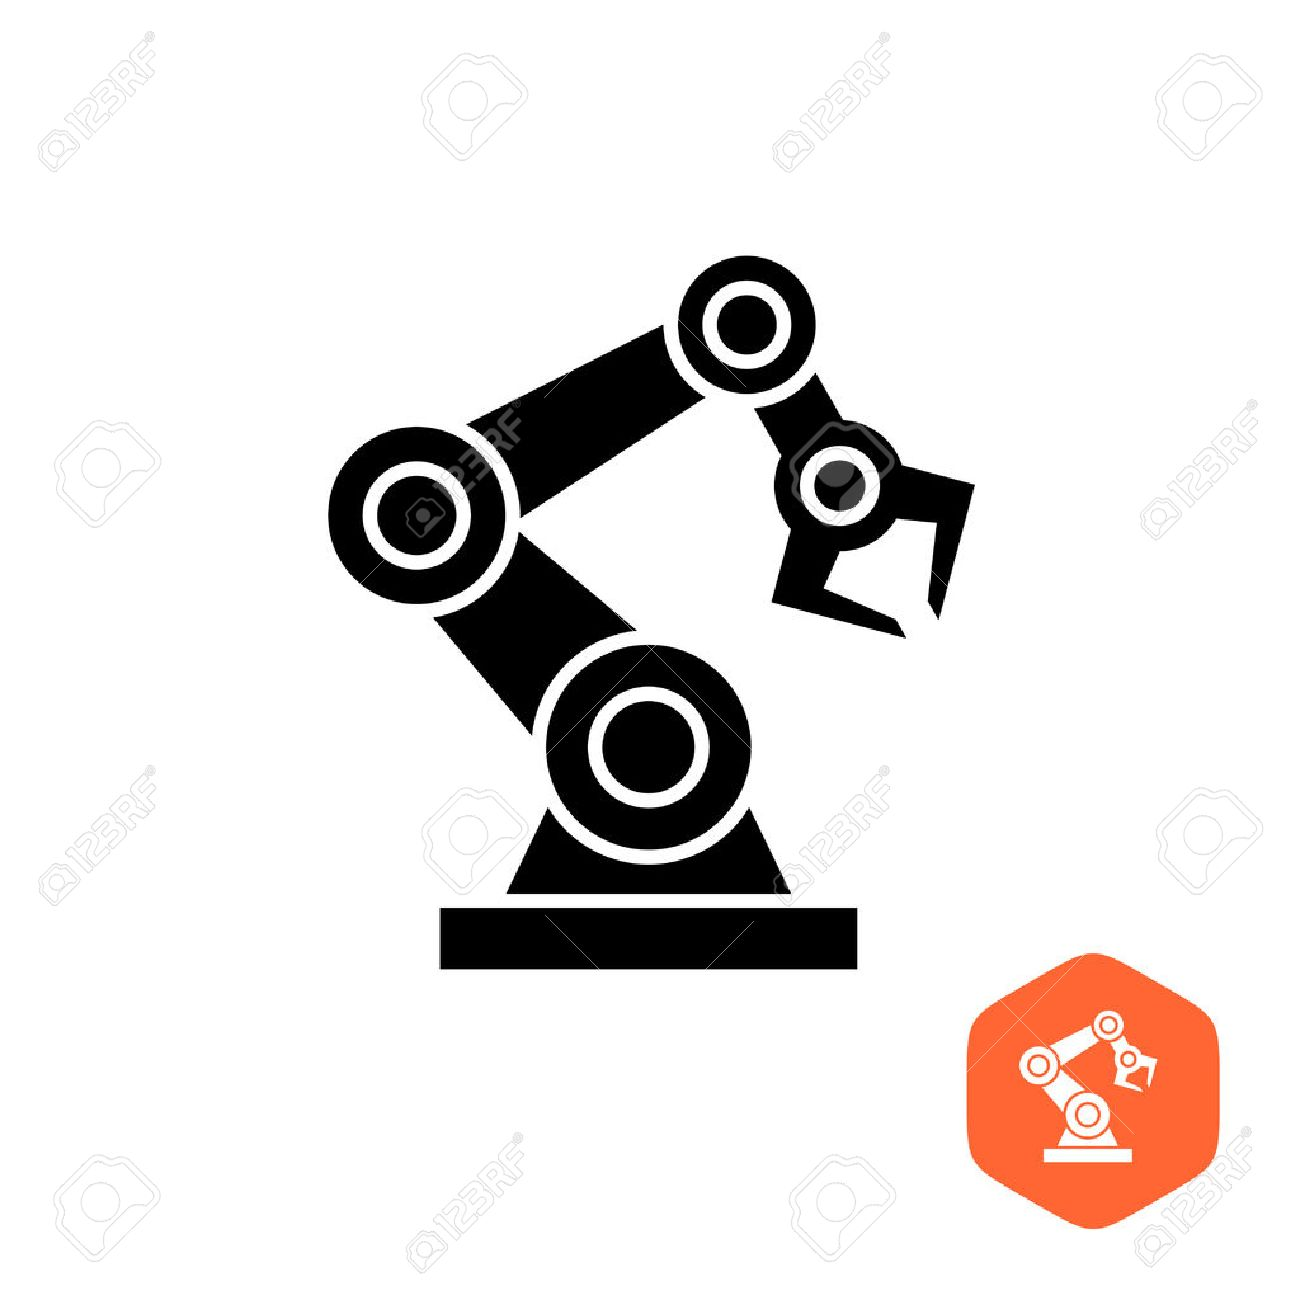 Robotic hand manipulator black silhouette symbol icon. Robot limb . - 54919437